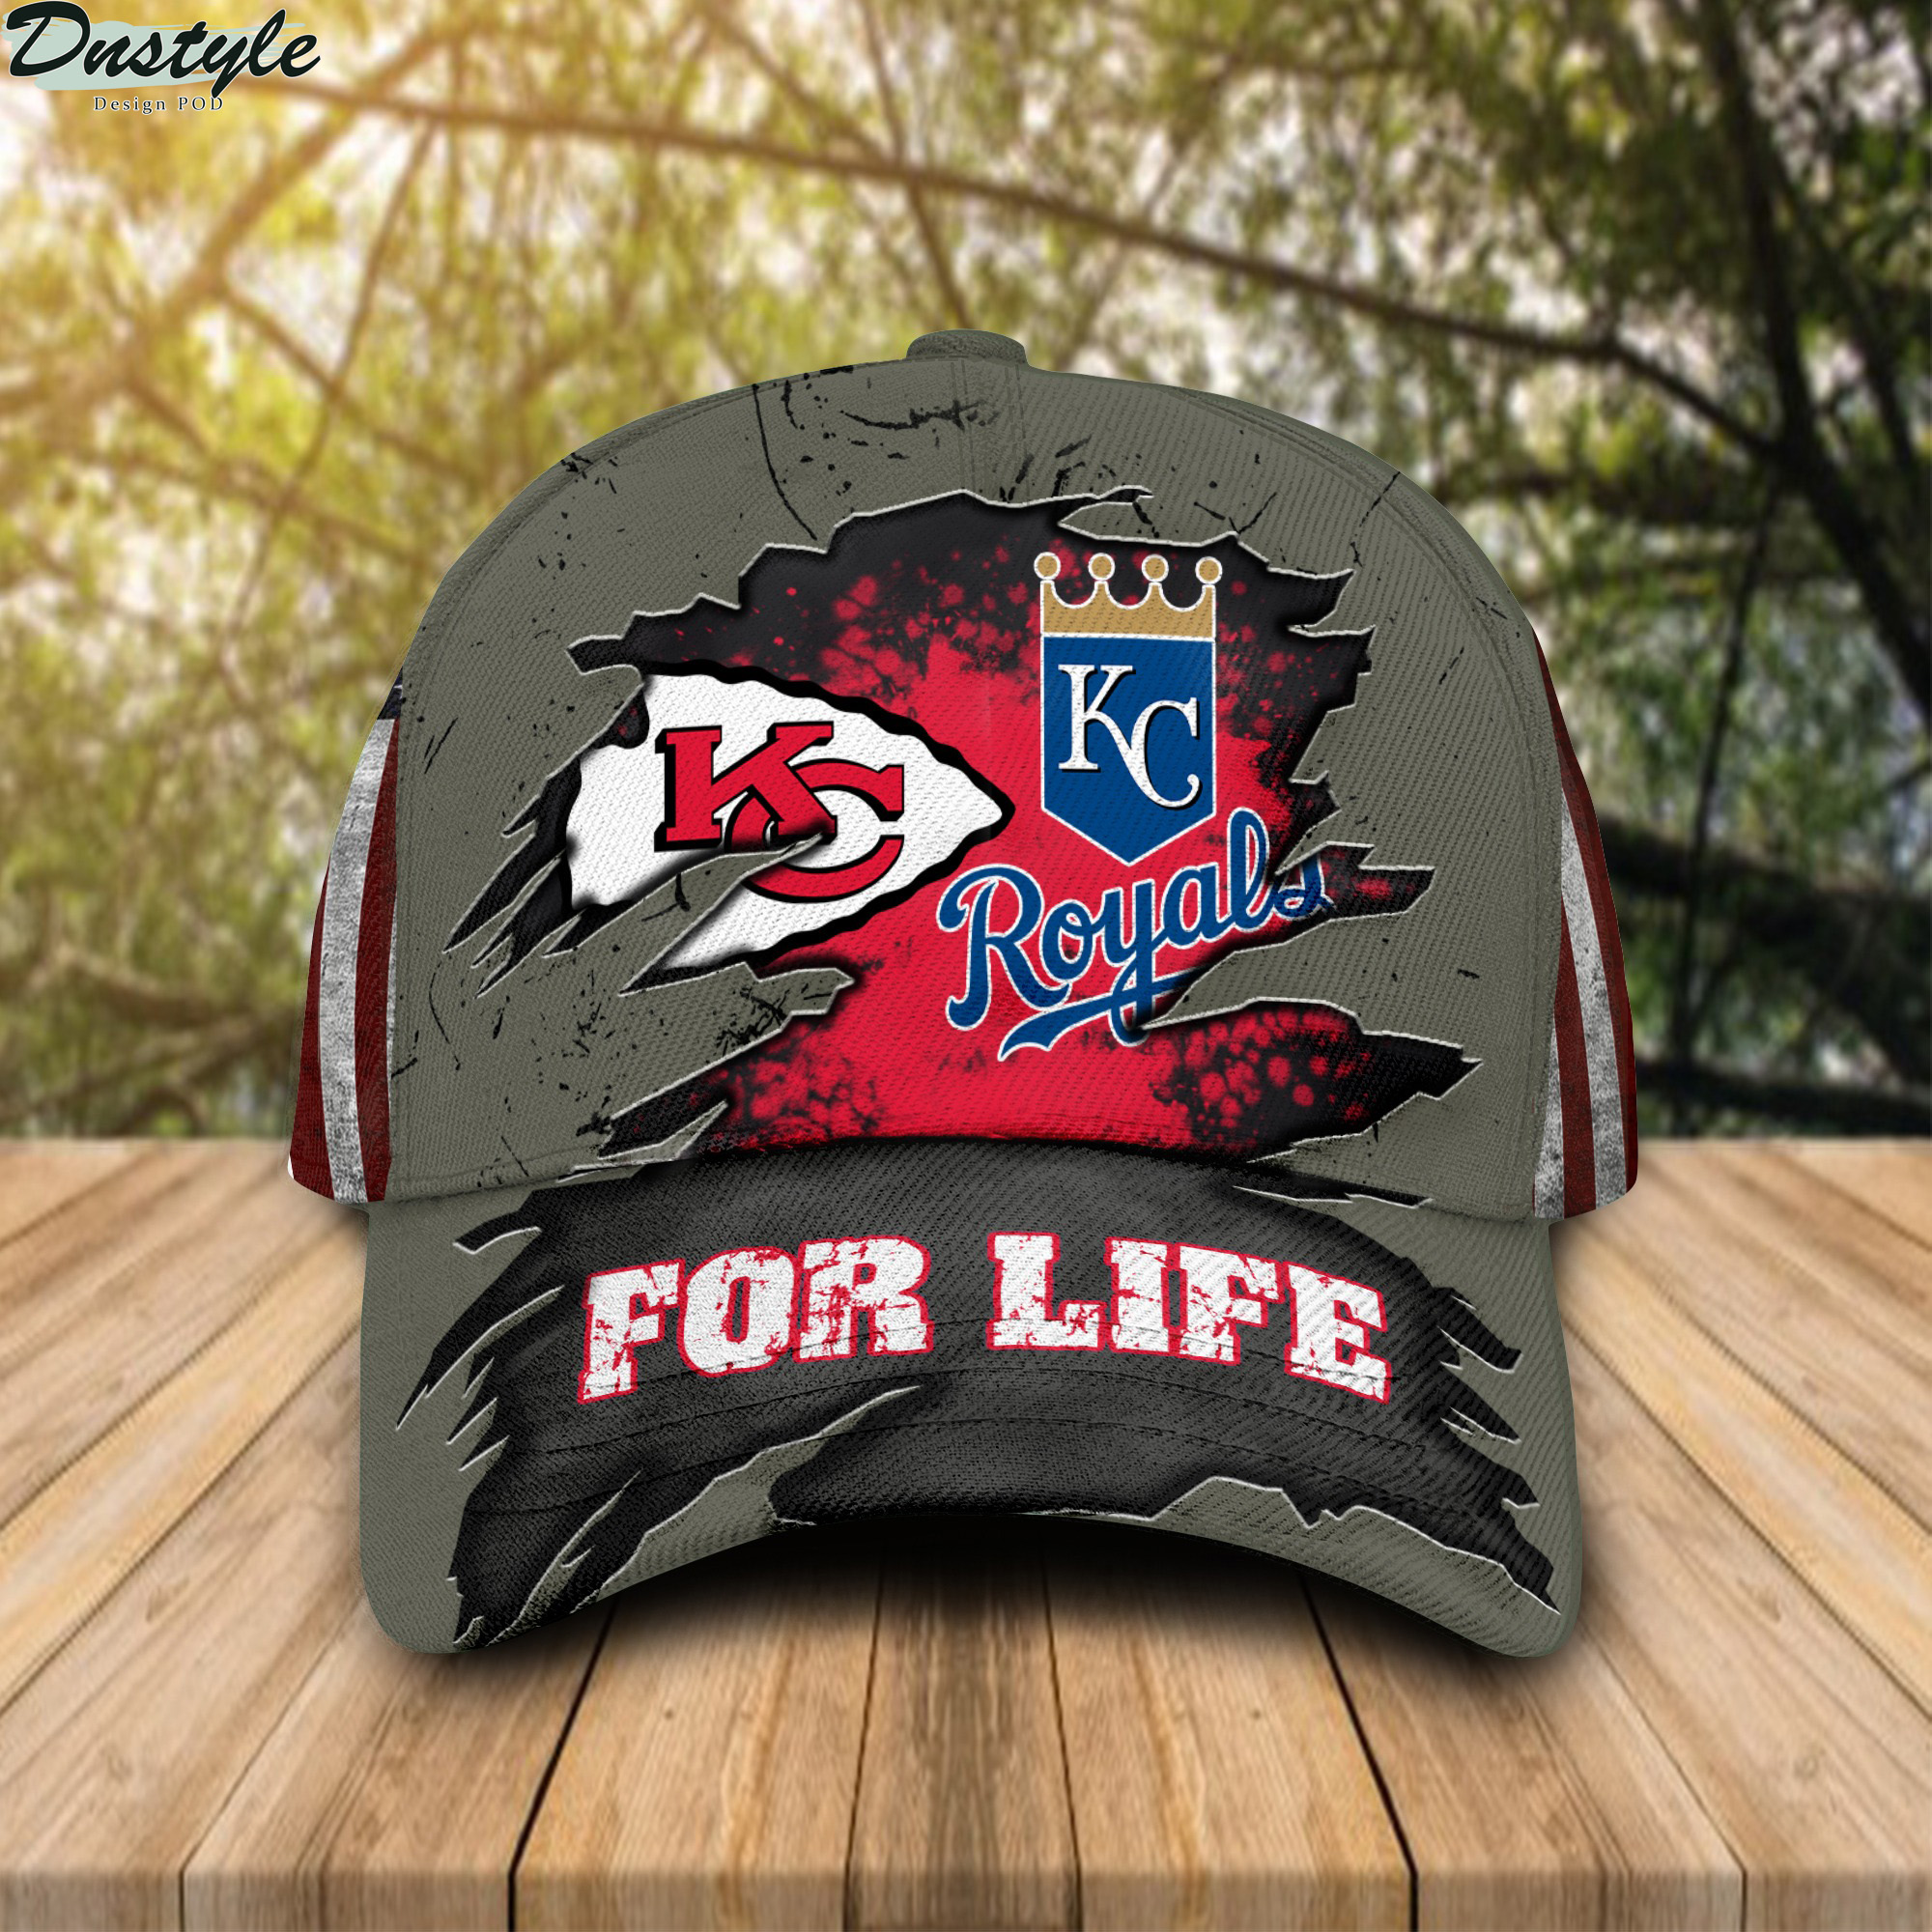 Kansas city chiefs and kansas city royals for life cap